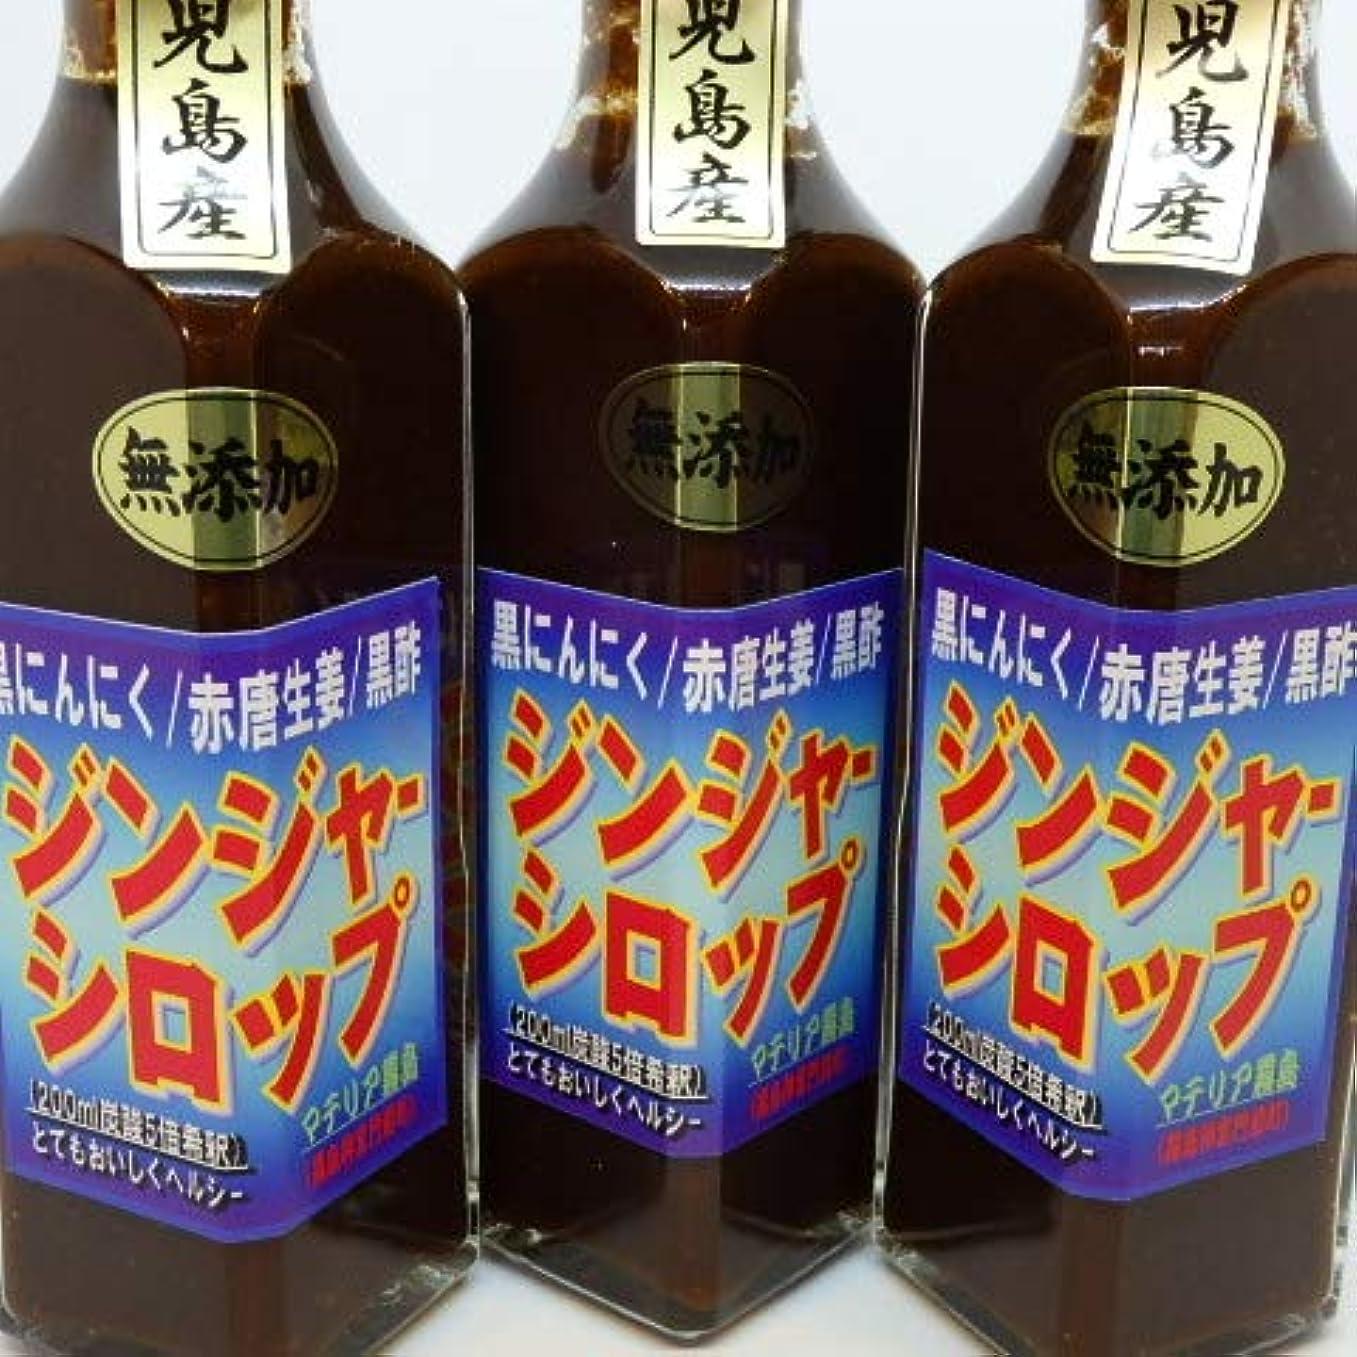 無添加健康食品/黒酢黒ジンジャ-/無添加/200ml×3組90日分¥10,800